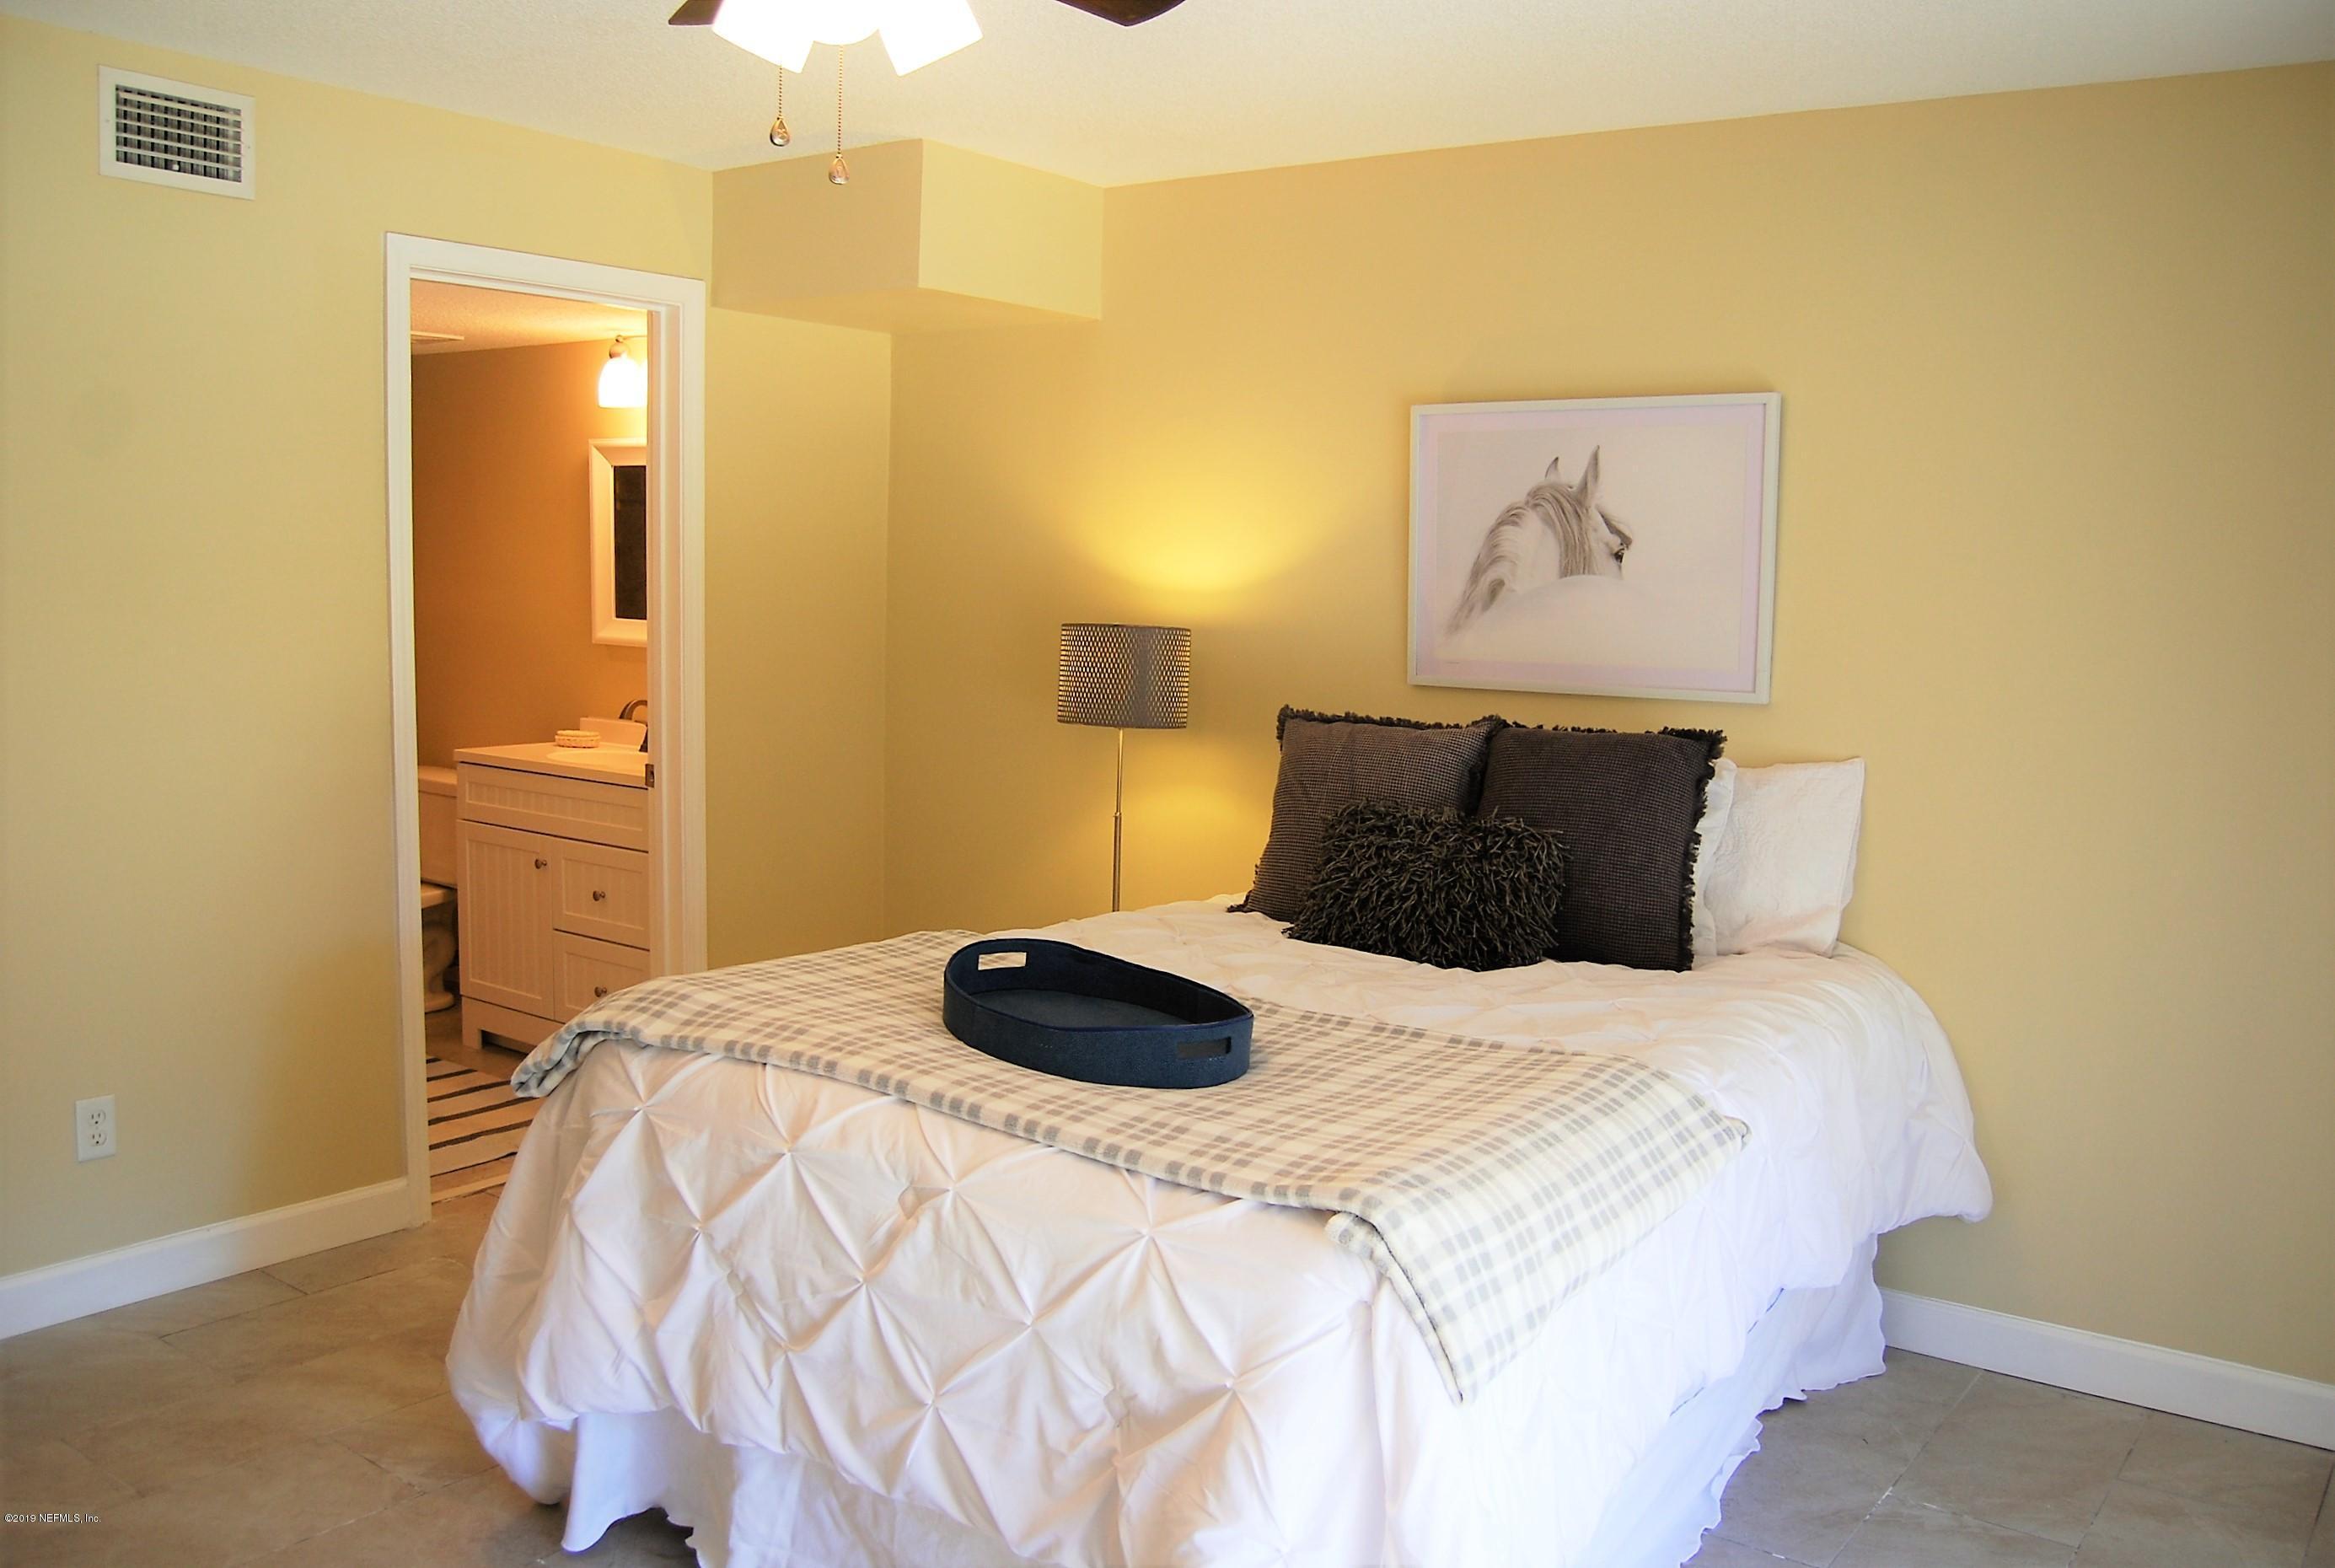 5375 ORTEGA FARMS, JACKSONVILLE, FLORIDA 32210, 2 Bedrooms Bedrooms, ,2 BathroomsBathrooms,Residential - condos/townhomes,For sale,ORTEGA FARMS,978765